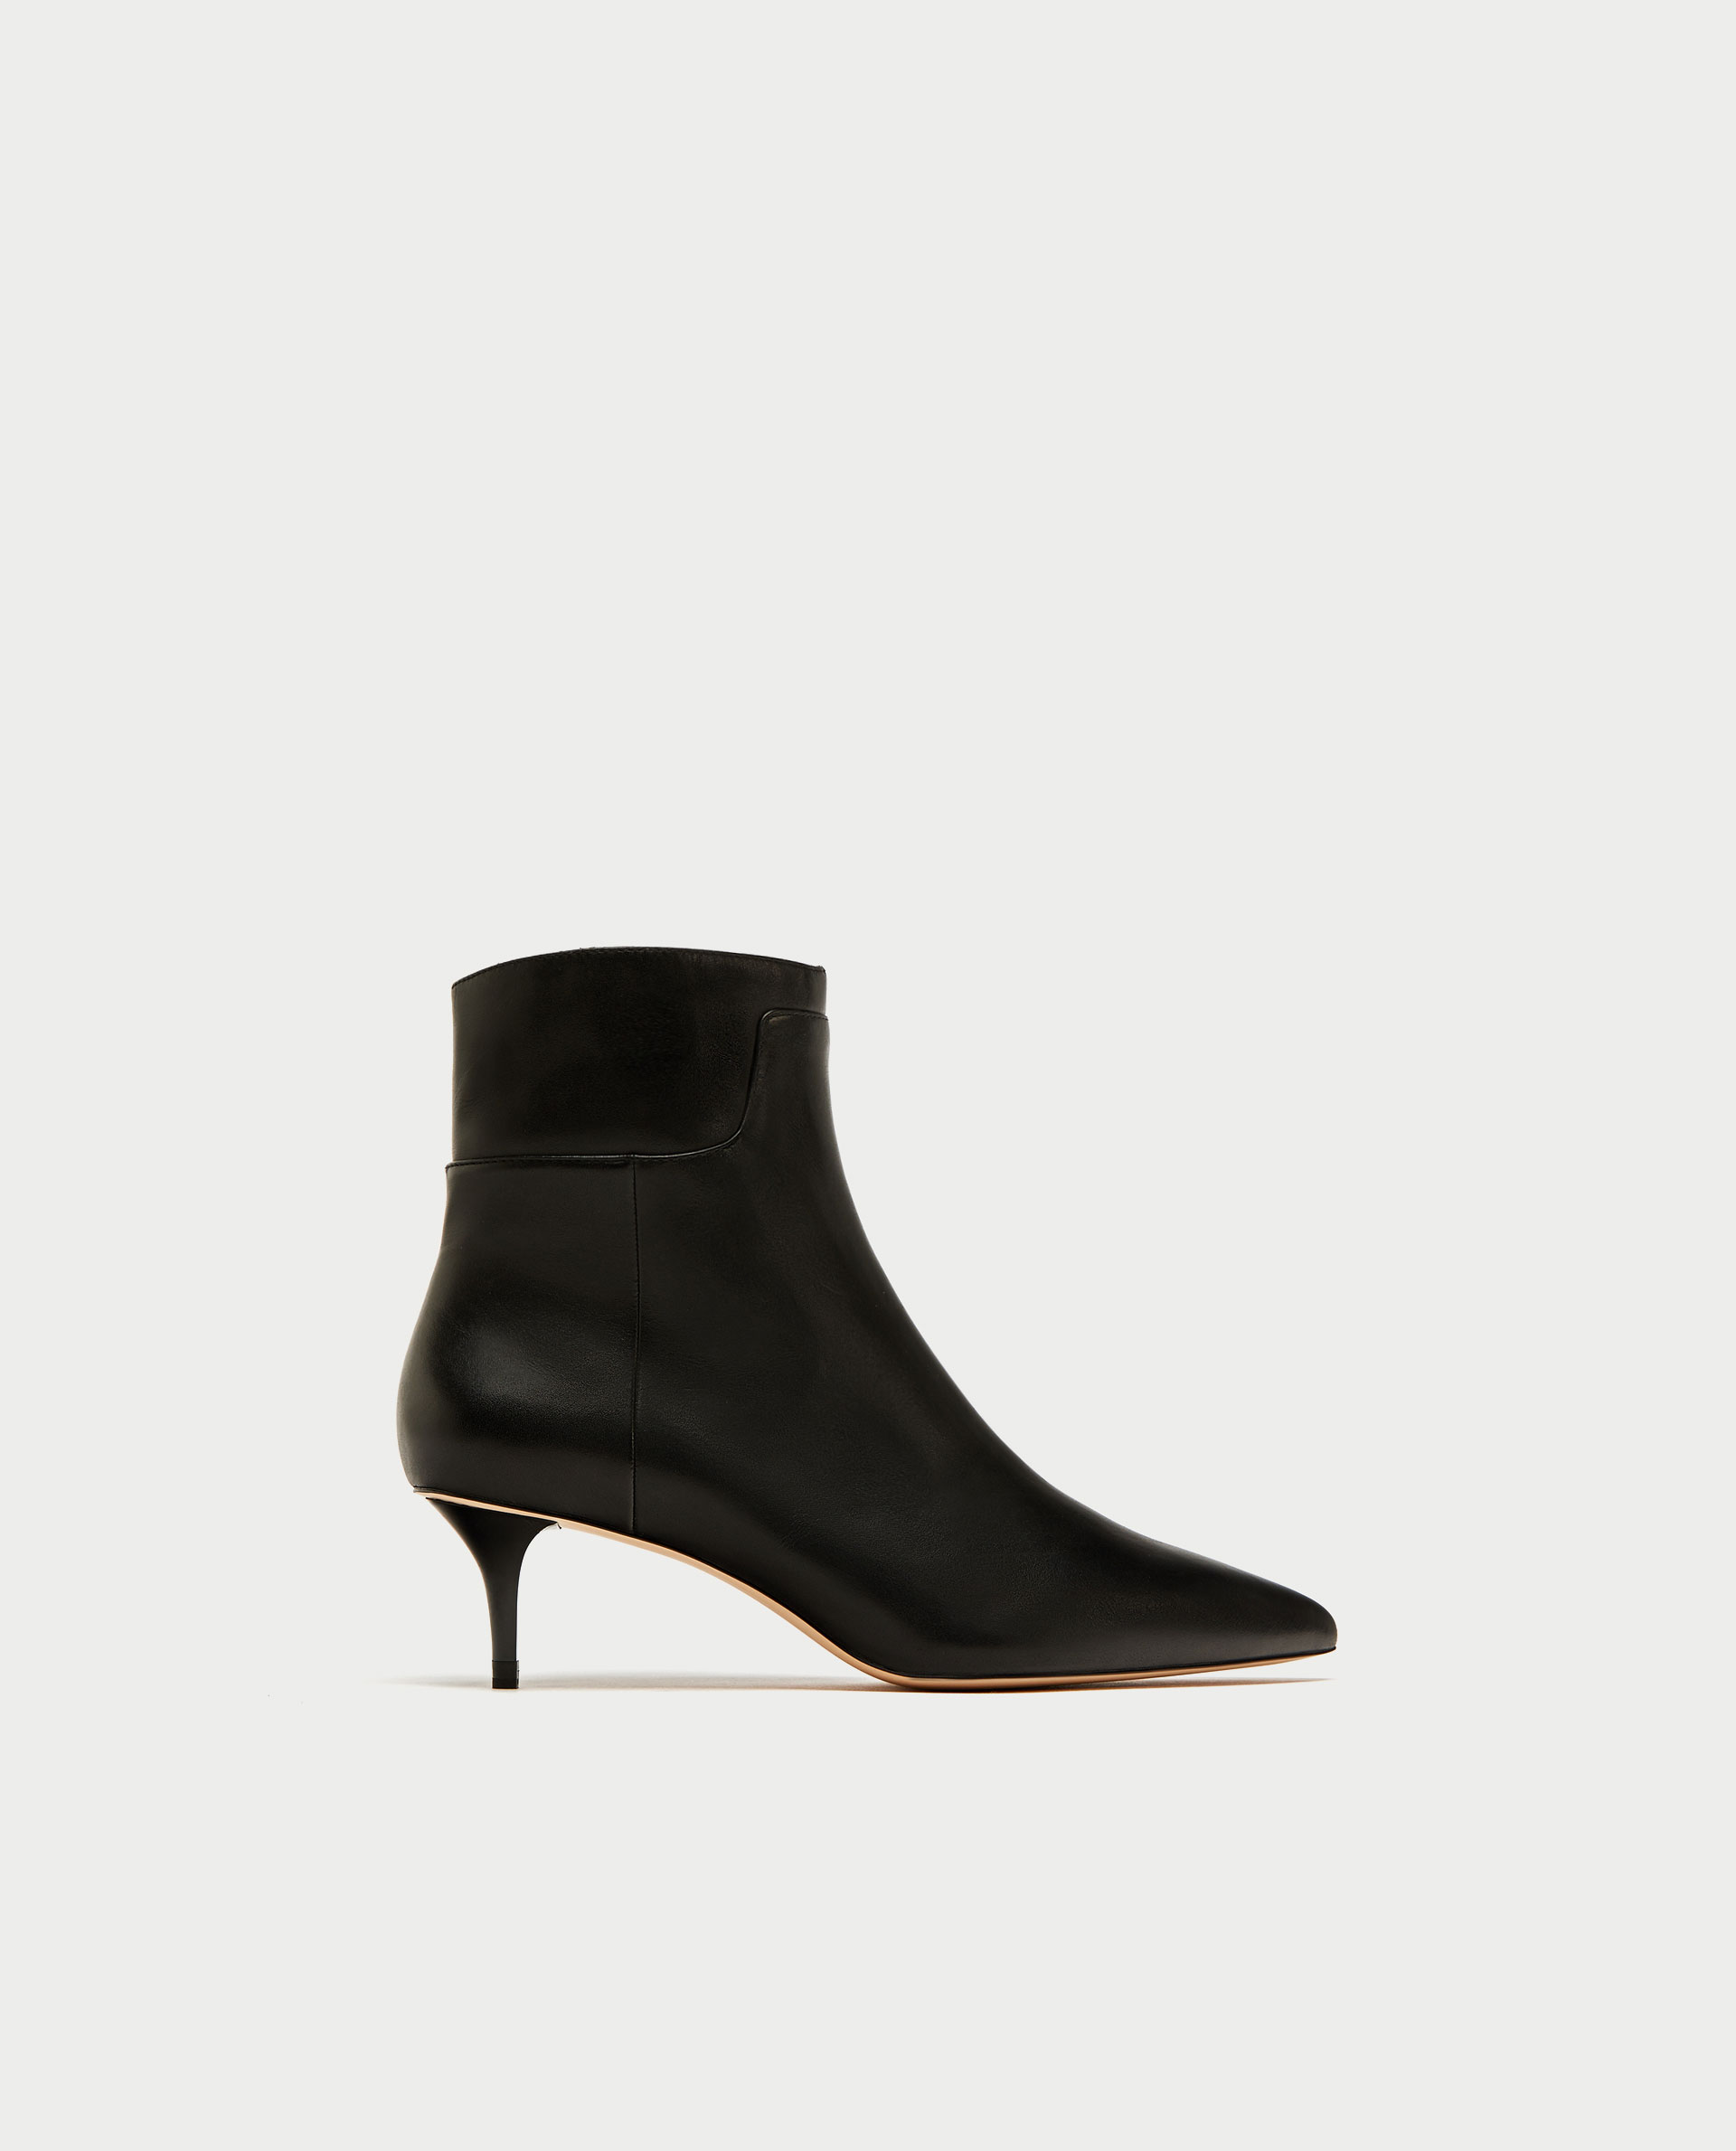 - LEATHER ANKLE BOOTS / Zara $100*photo via Zara